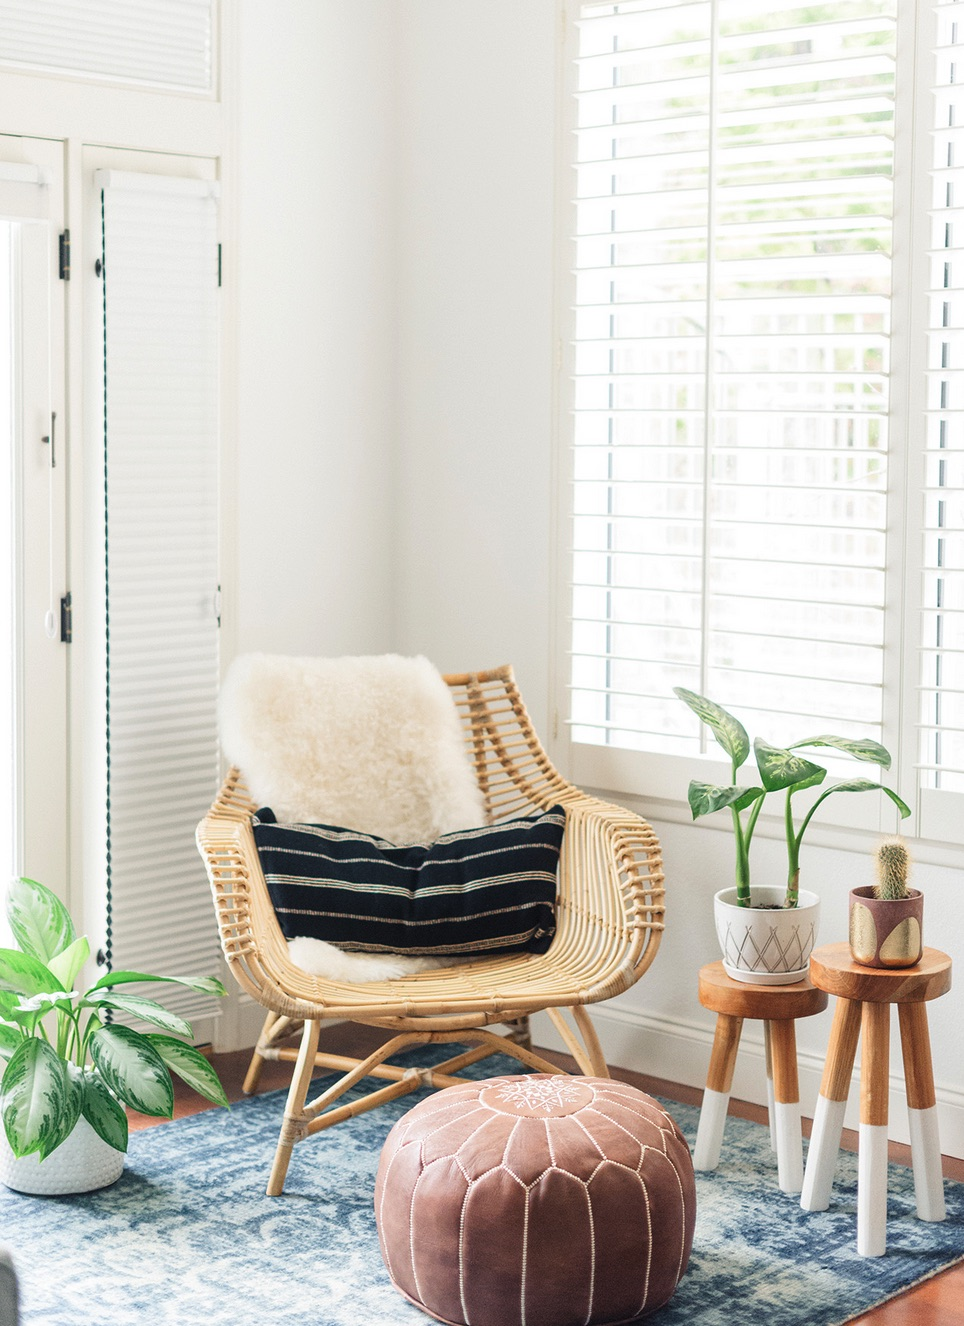 Boho bedroom sitting area